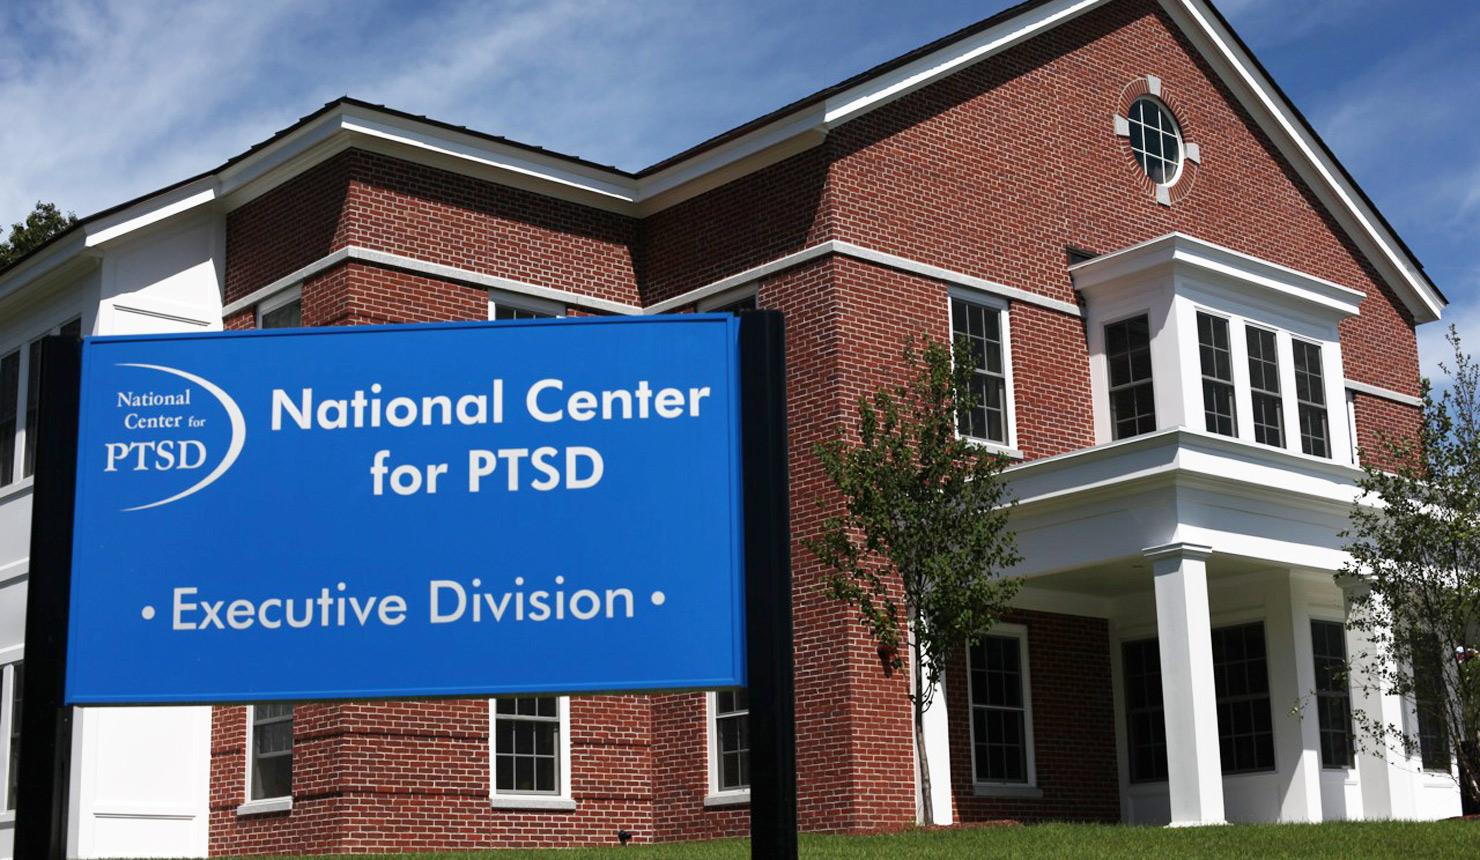 Paula Schnurr Named Executive Director of VA's National Center for PTSD